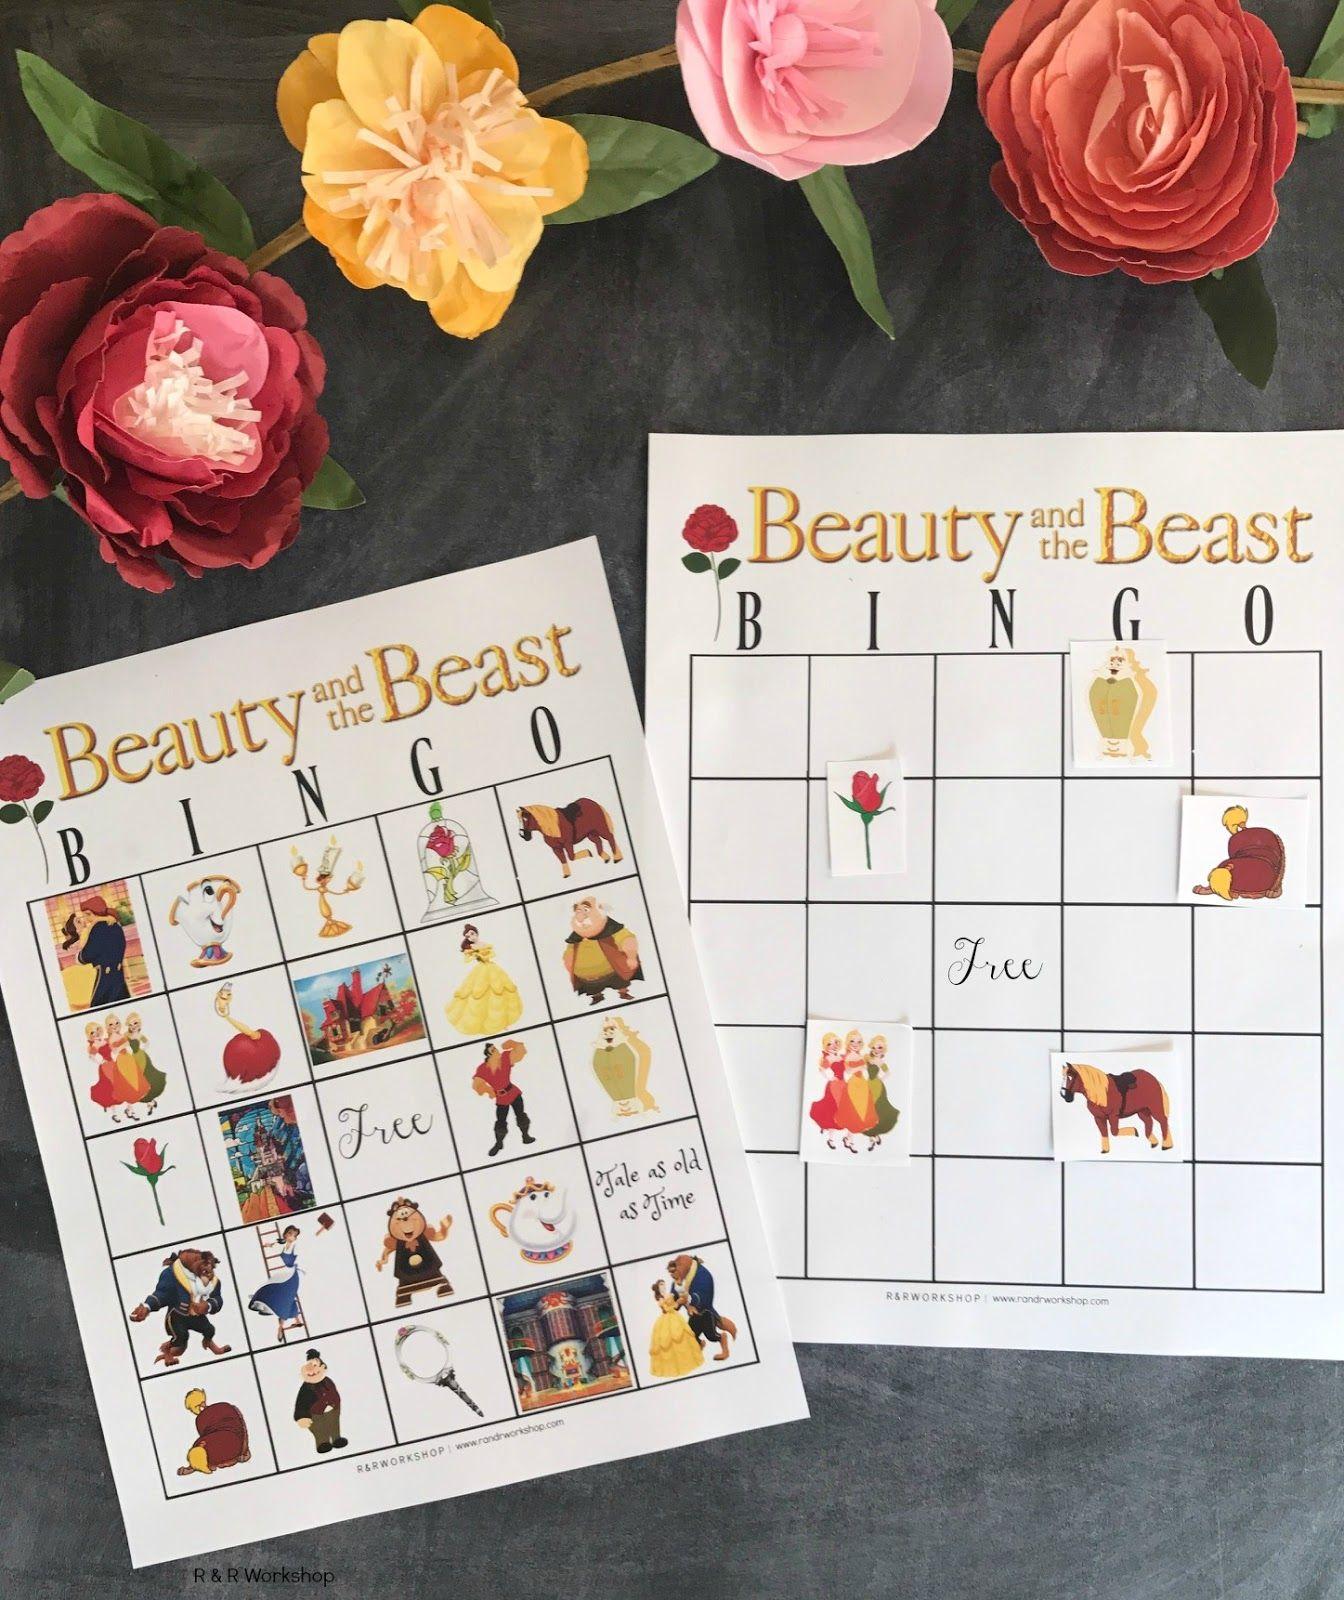 Beauty and the Beast Bingo Game (Free Printable) Beauty